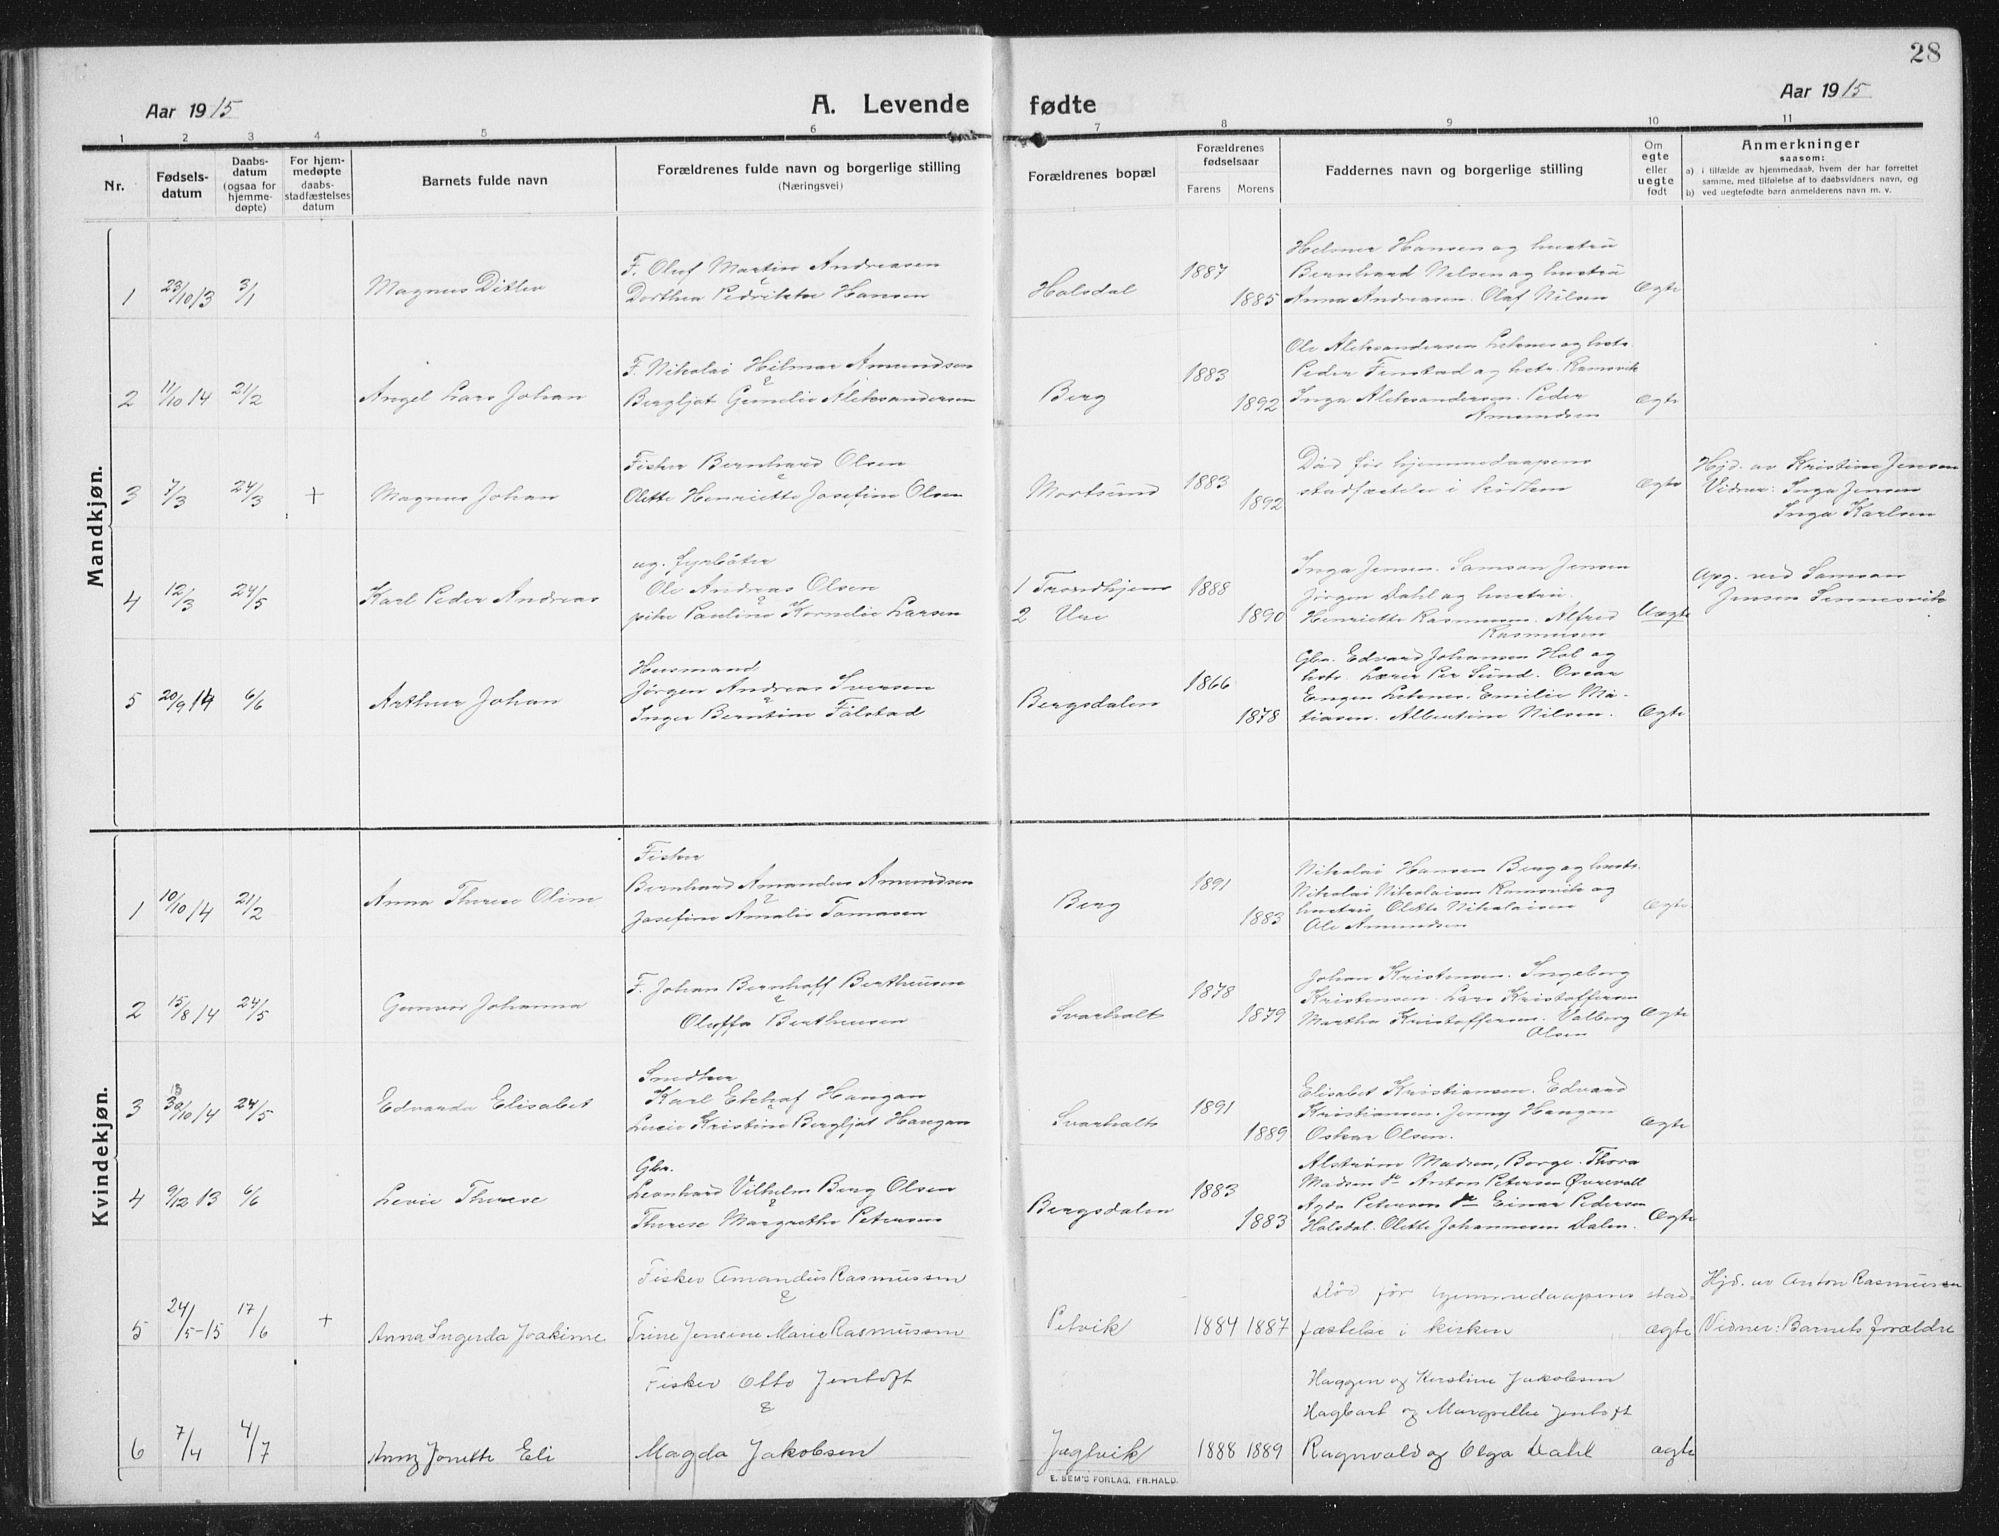 SAT, Ministerialprotokoller, klokkerbøker og fødselsregistre - Nordland, 882/L1183: Klokkerbok nr. 882C01, 1911-1938, s. 28